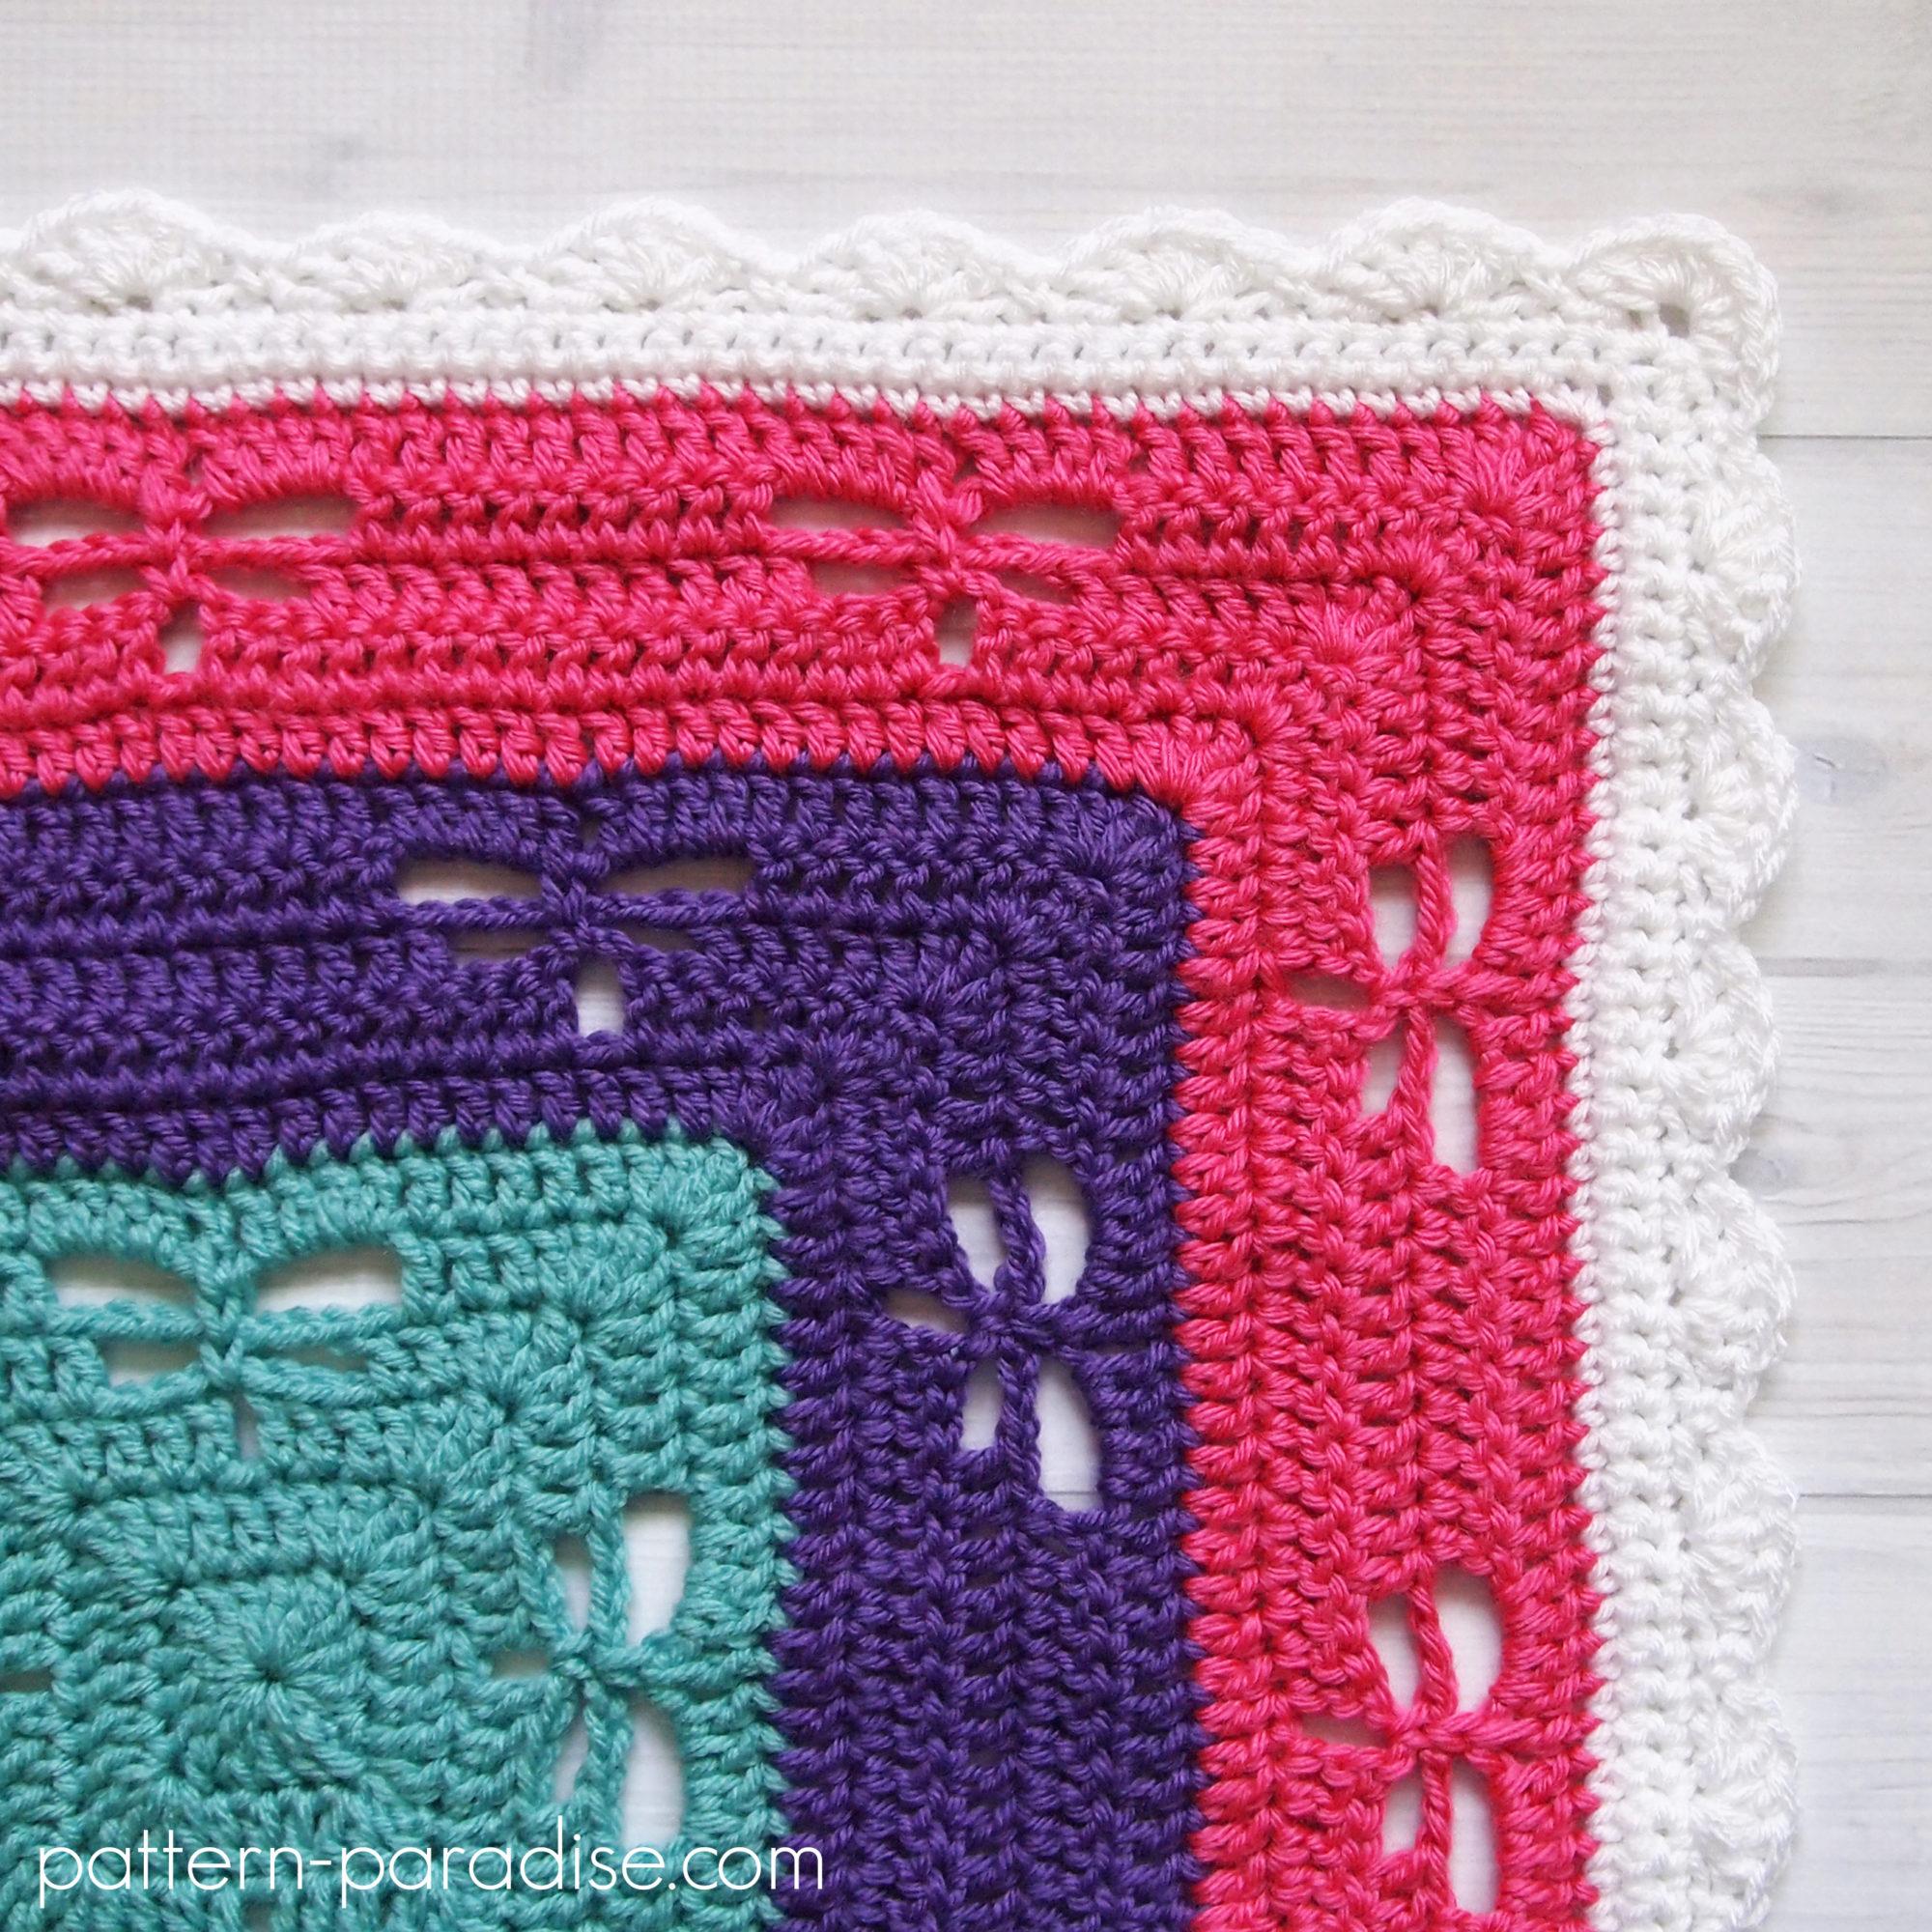 Free Crochet Pattern Radiating Dragonflies Throw Pattern Paradise